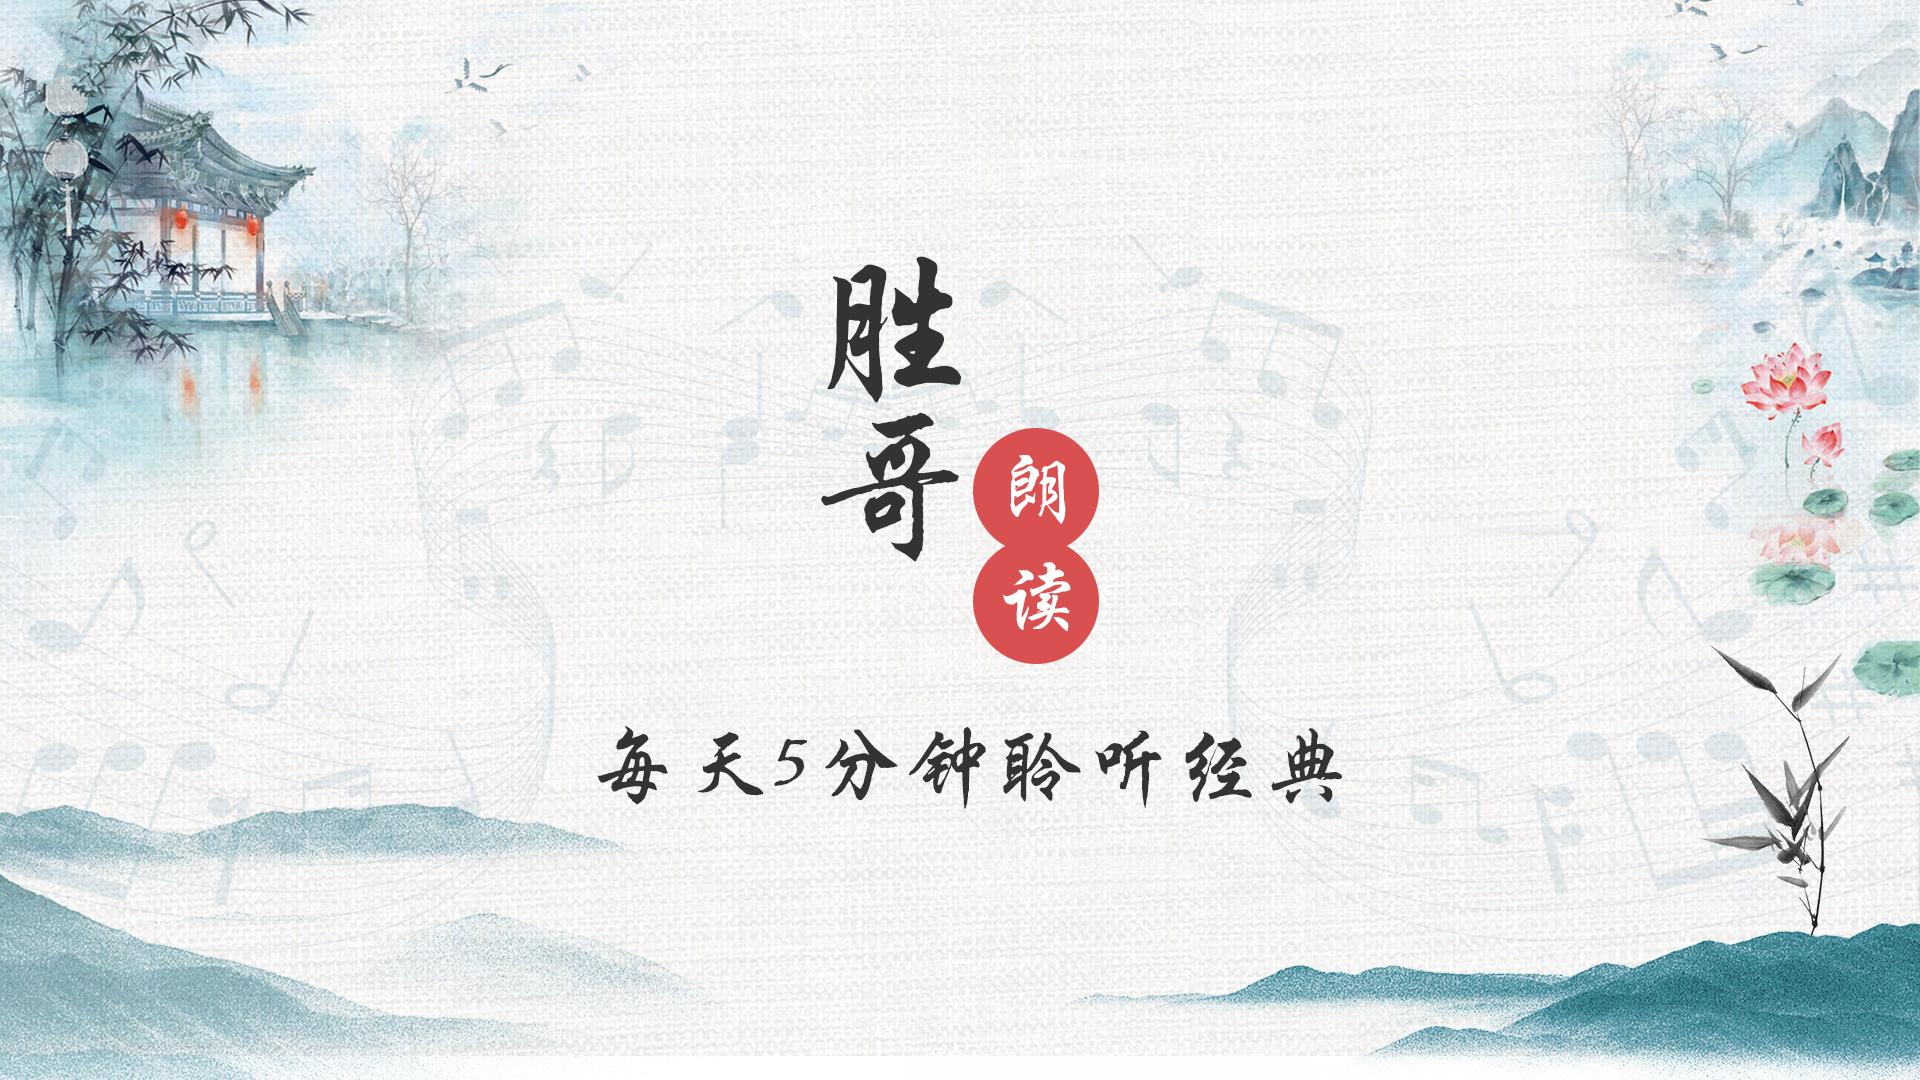 勝哥朗讀封面圖.png